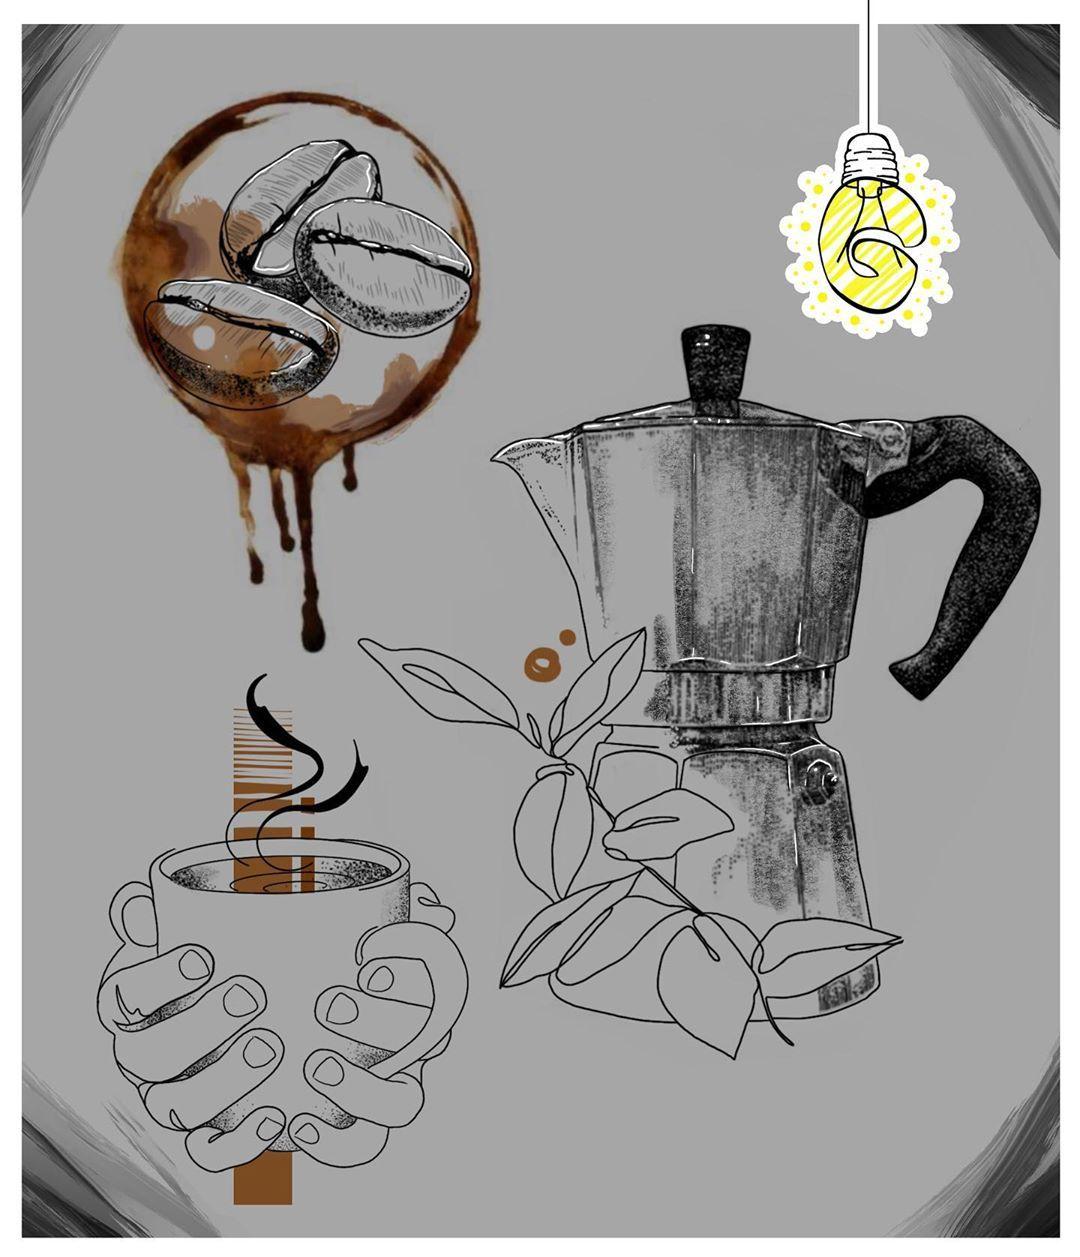 Kawa razy trzy 😍  uwielbiam kawę, a Wy?  #coffeetime #coffee #coffeelover #coffeeart #coffeetattoo #coffeelovers #artofinstagram #flashtattoo #ideafortattoo #tattoo #projecttattoo #tattoodesign #newprojects #grazkaart #polandtattoos #wroclawtattoo #witrynatattoo #ktosieniedziaratenfujara